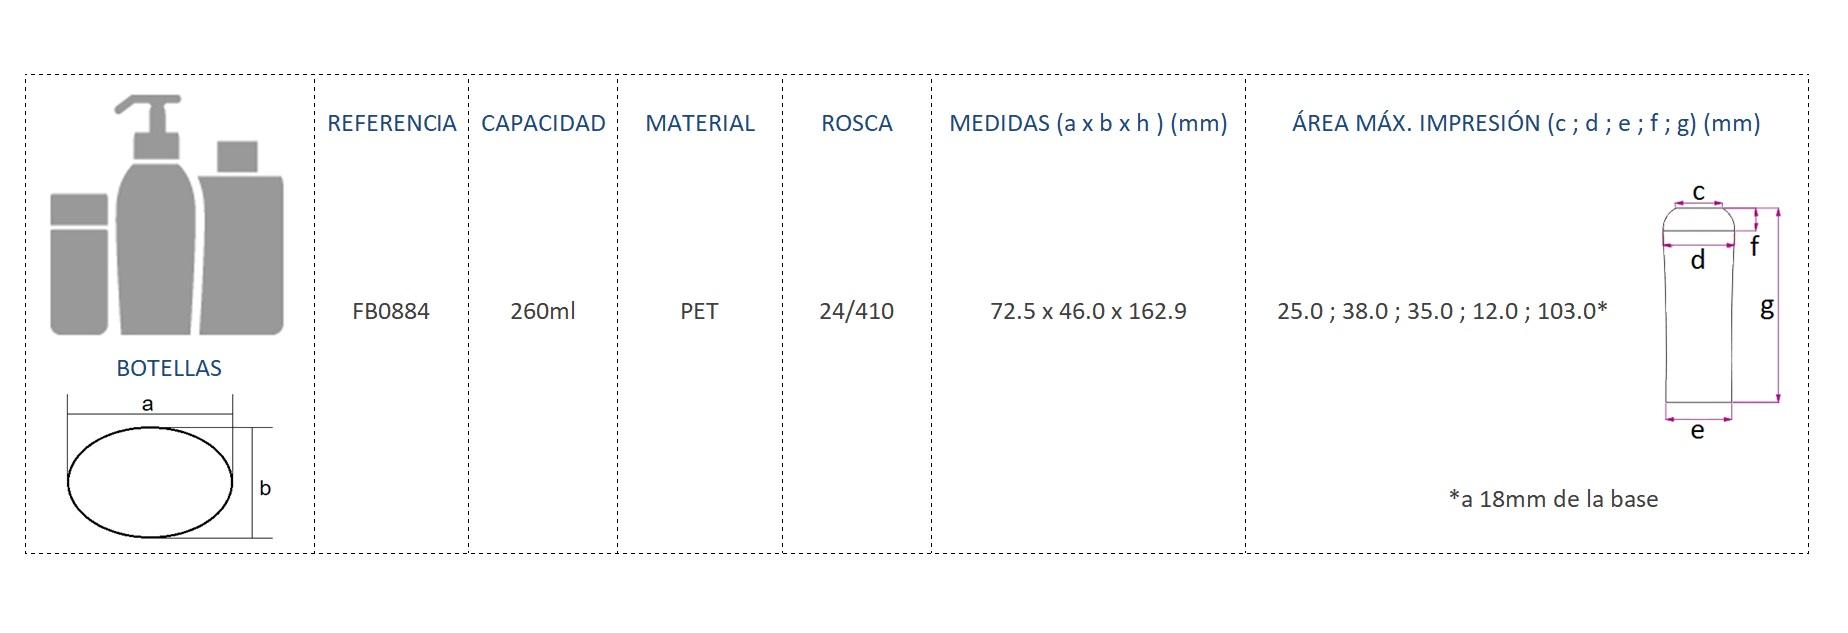 Cuadro de materiales botella FB0884